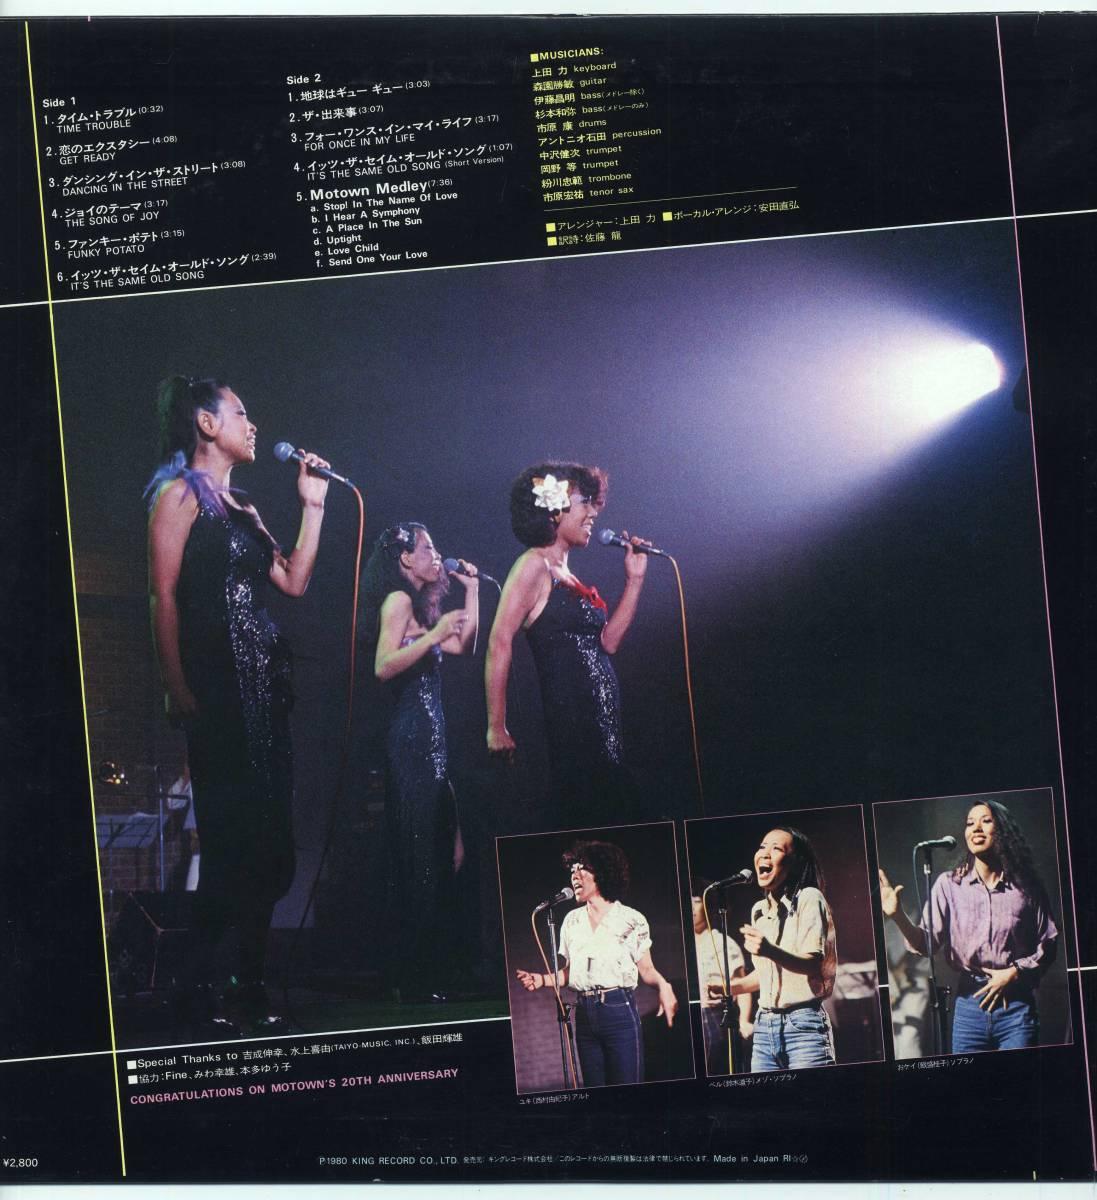 LP★JoyジョイIT'S THE SAME OLD SONG(見本白販促付/'80/上田力)★1st/K28A-105/森園勝敏/シュープリームスソウルディスコMOTOWN和モノ_画像2